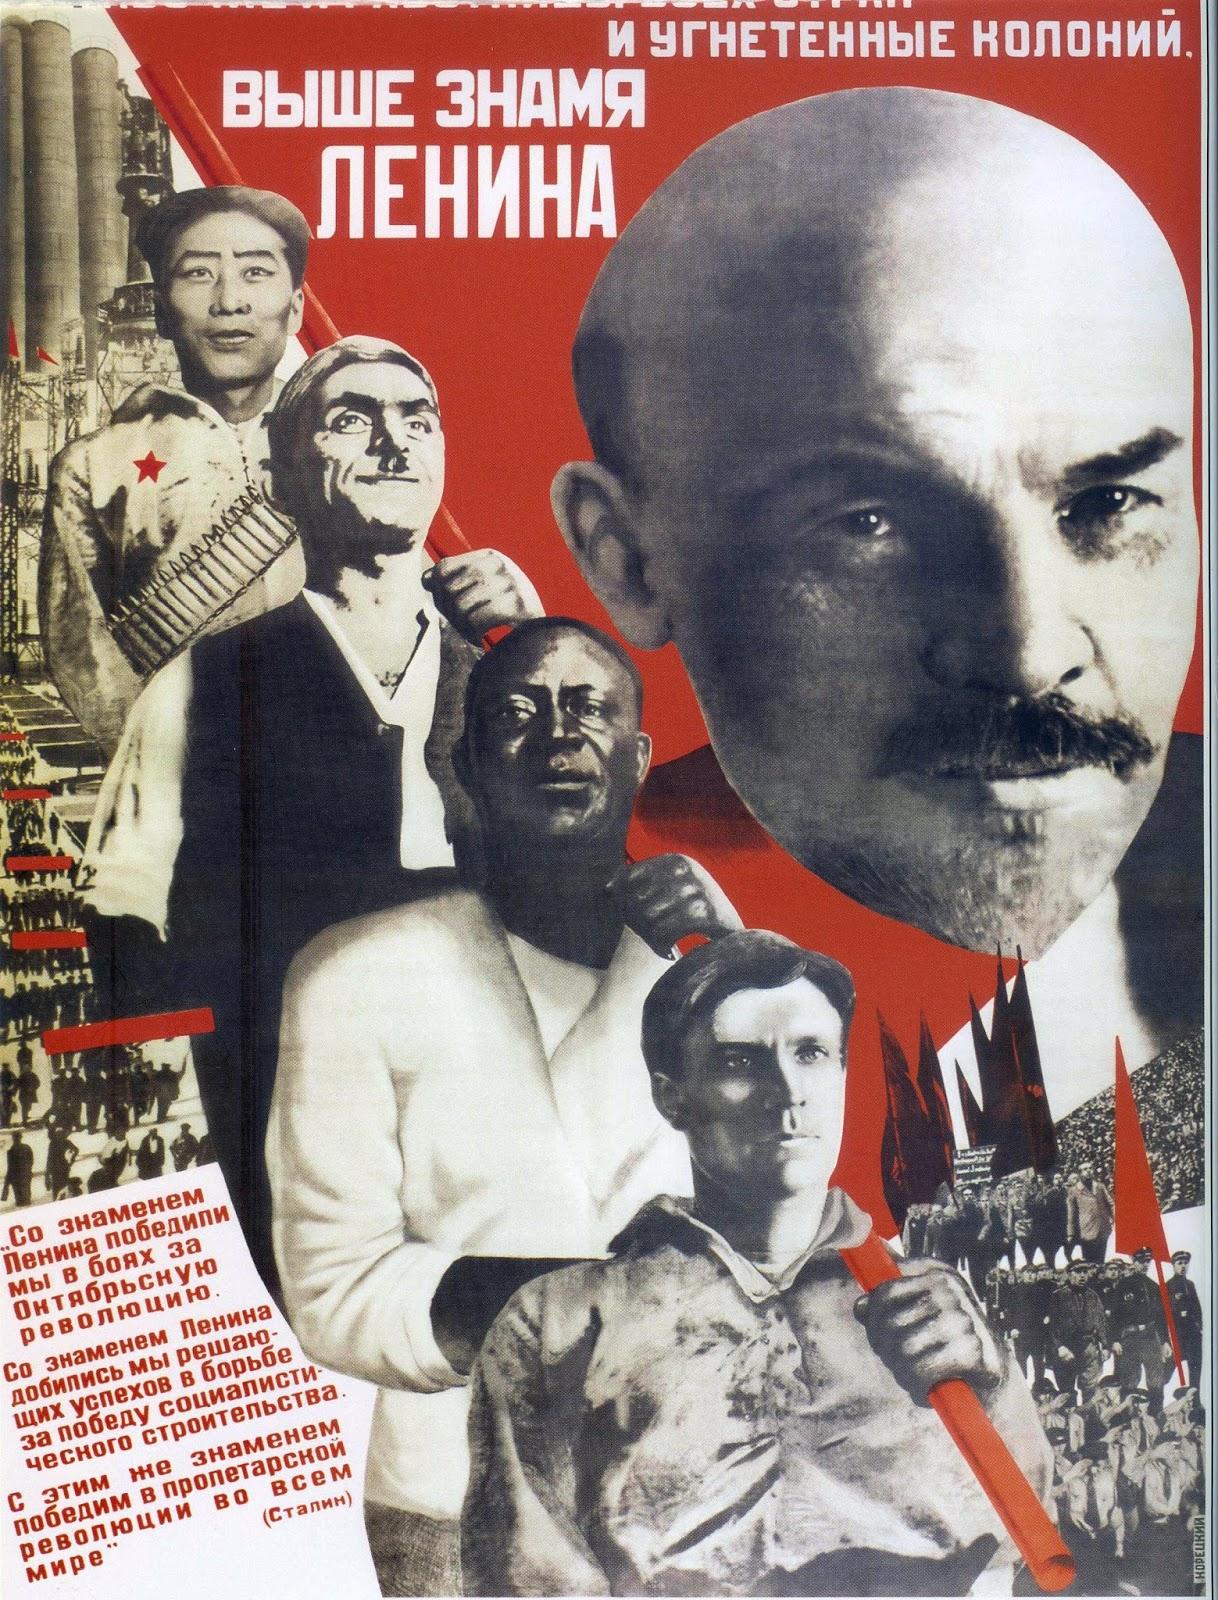 poster, Lenin's mausoleum, Мавзоле́й Ле́нина, lenin's tomb, communism, socialism, russia, ussr, cccp, stalin, moscow, red square, october revolution, body, inside,